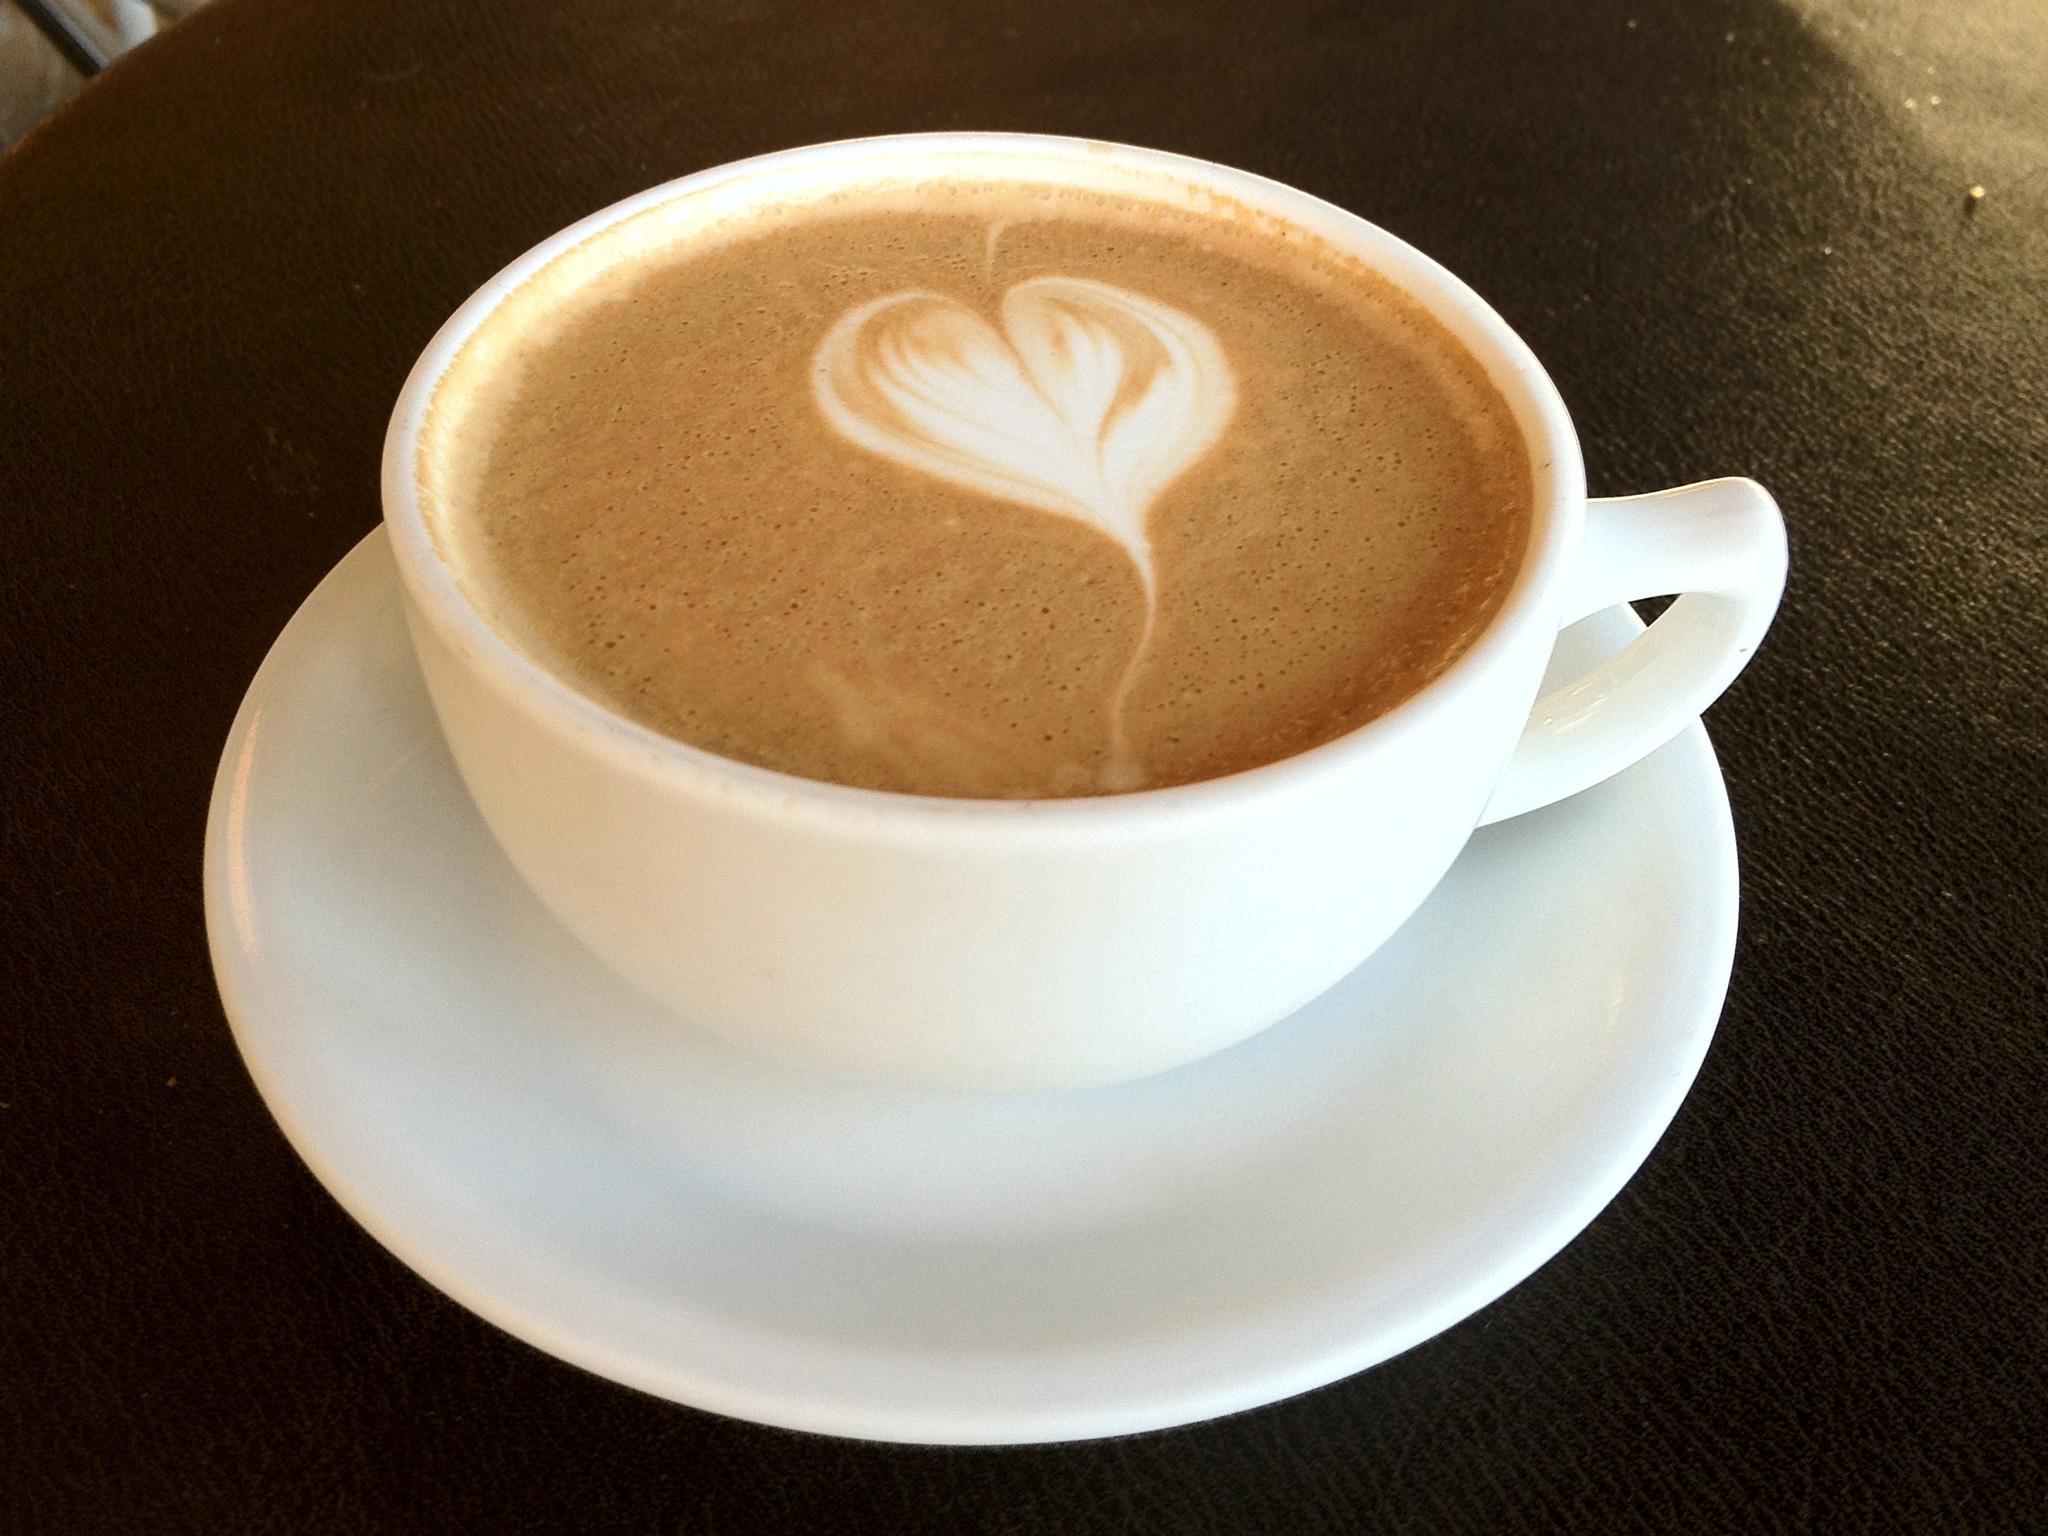 FOR NANNEE! HAHAHA Pearl-cup-latte-art